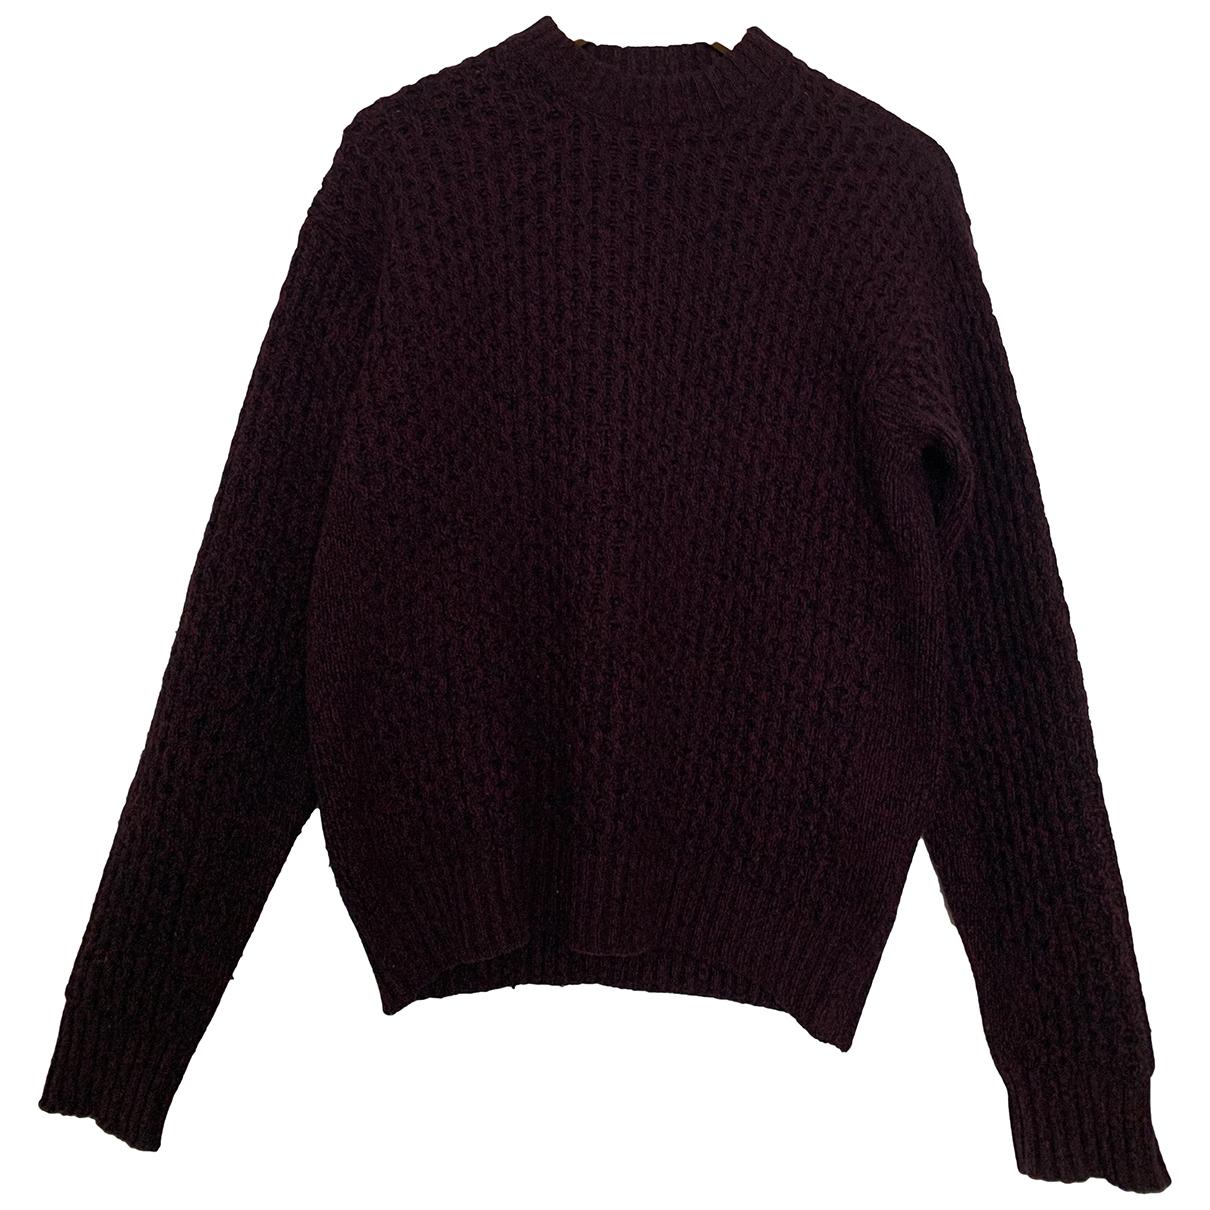 Prada \N Burgundy Wool Knitwear & Sweatshirts for Men 48 IT